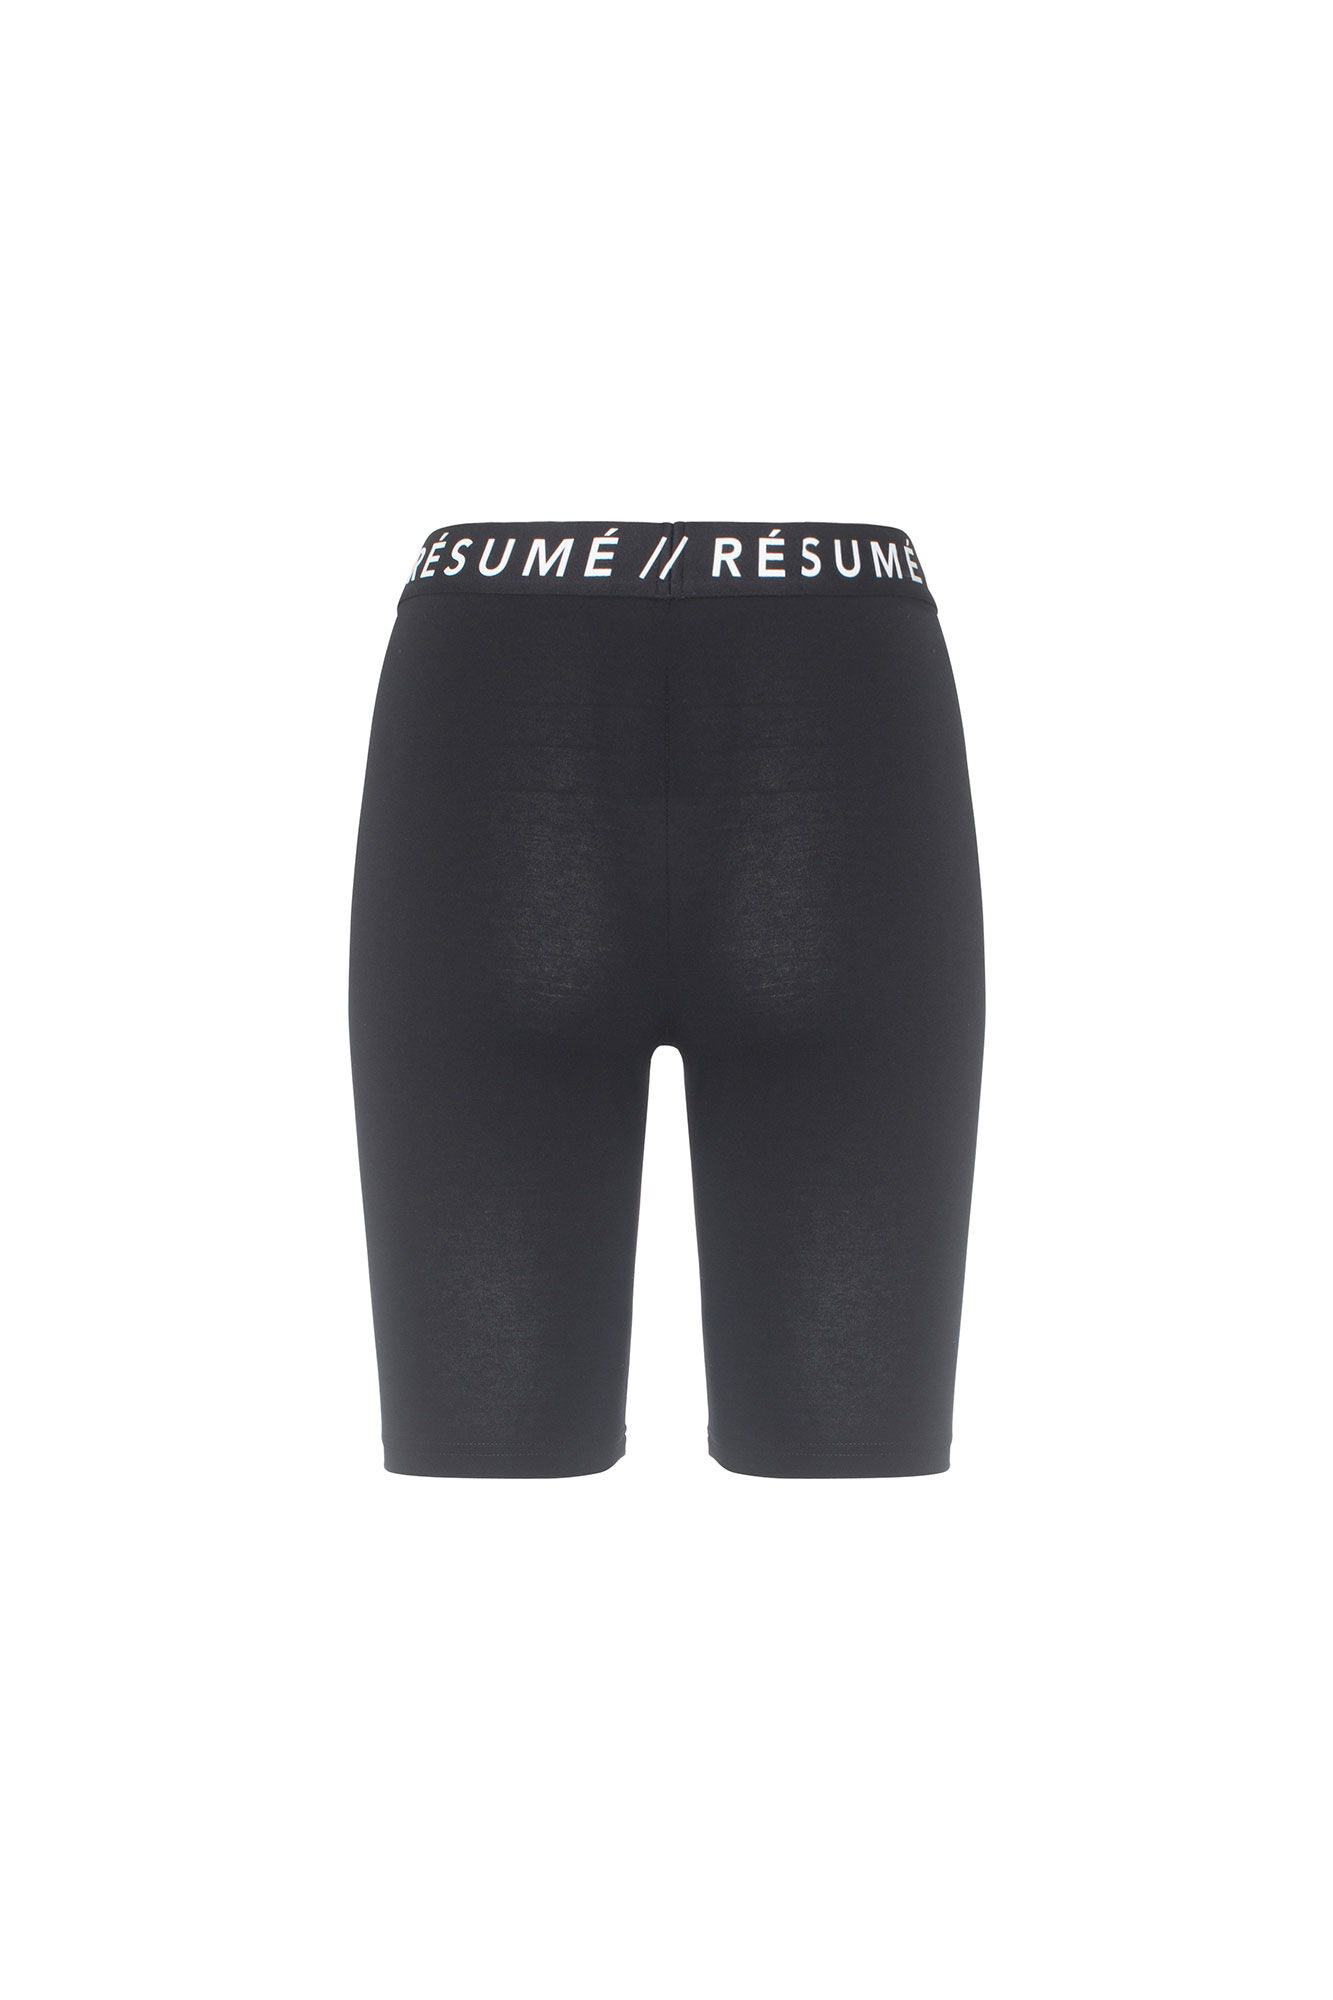 Resume tights 06100366, BLACK